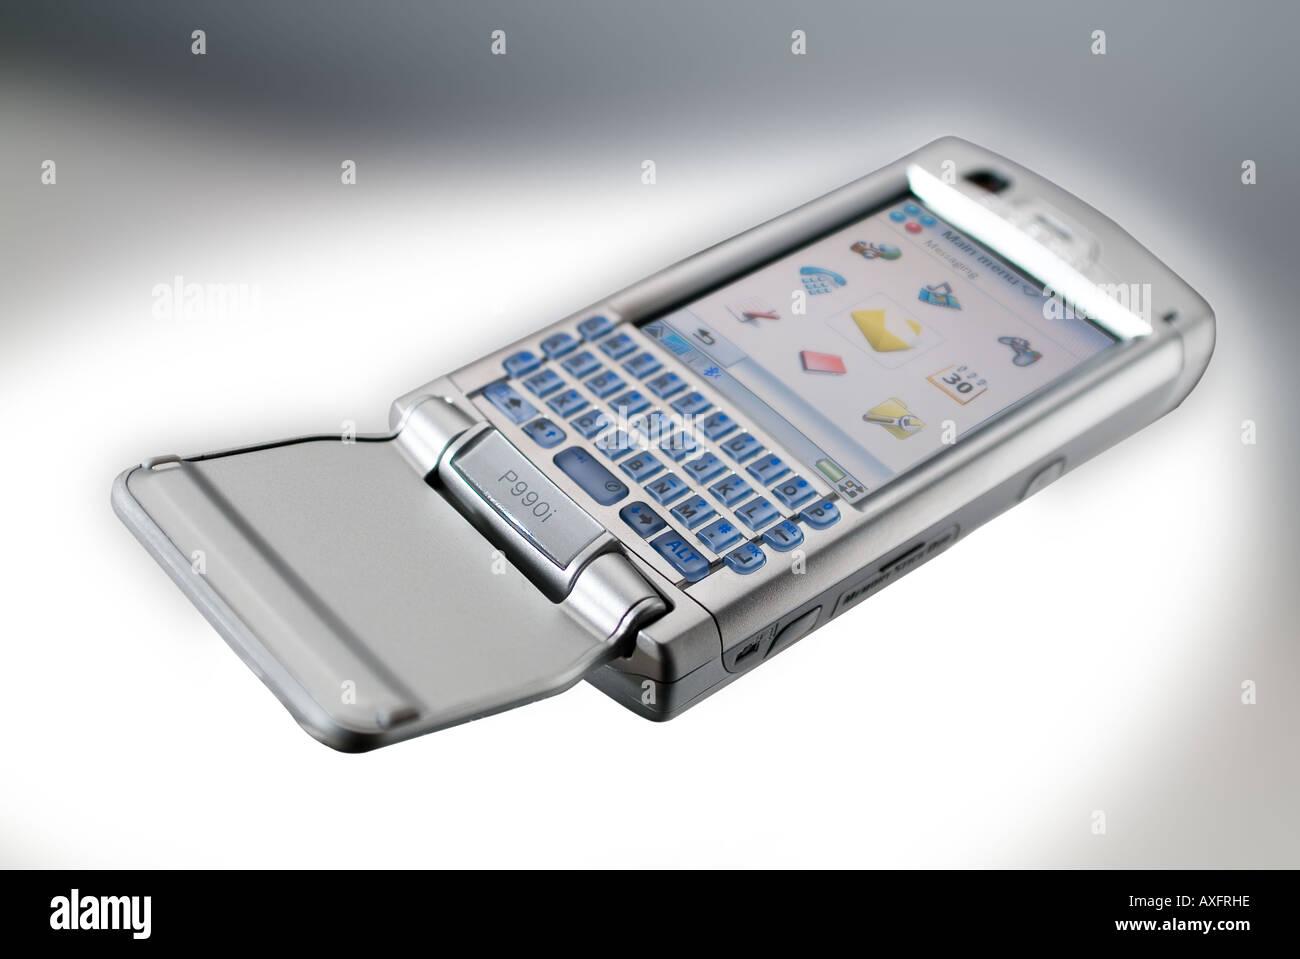 p990i mobile phone user manual professional user manual ebooks u2022 rh gogradresumes com Sony Ericsson Xperia X10 Sony Ericsson Xperia X10